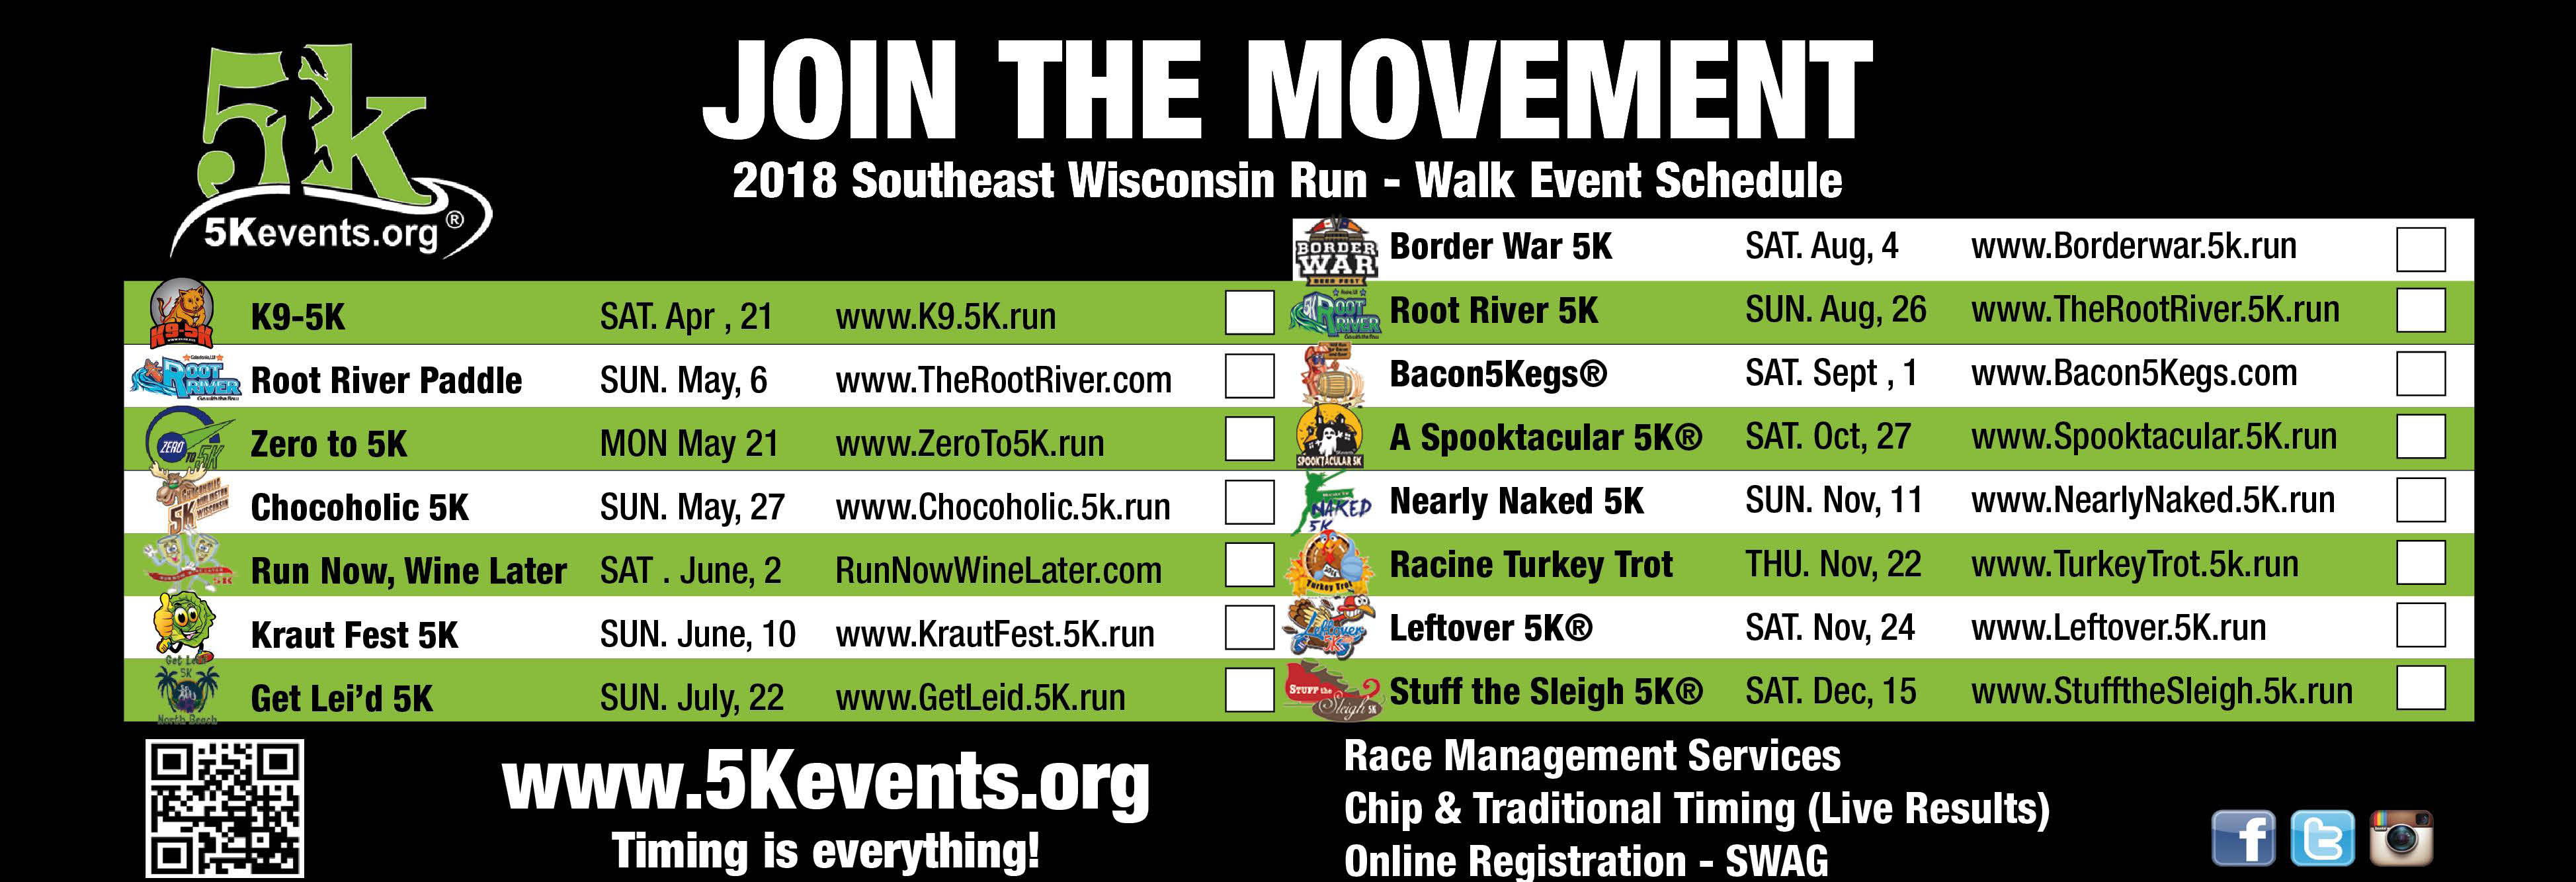 2018 Southeast Wisconsin Run Walk Event Schedule